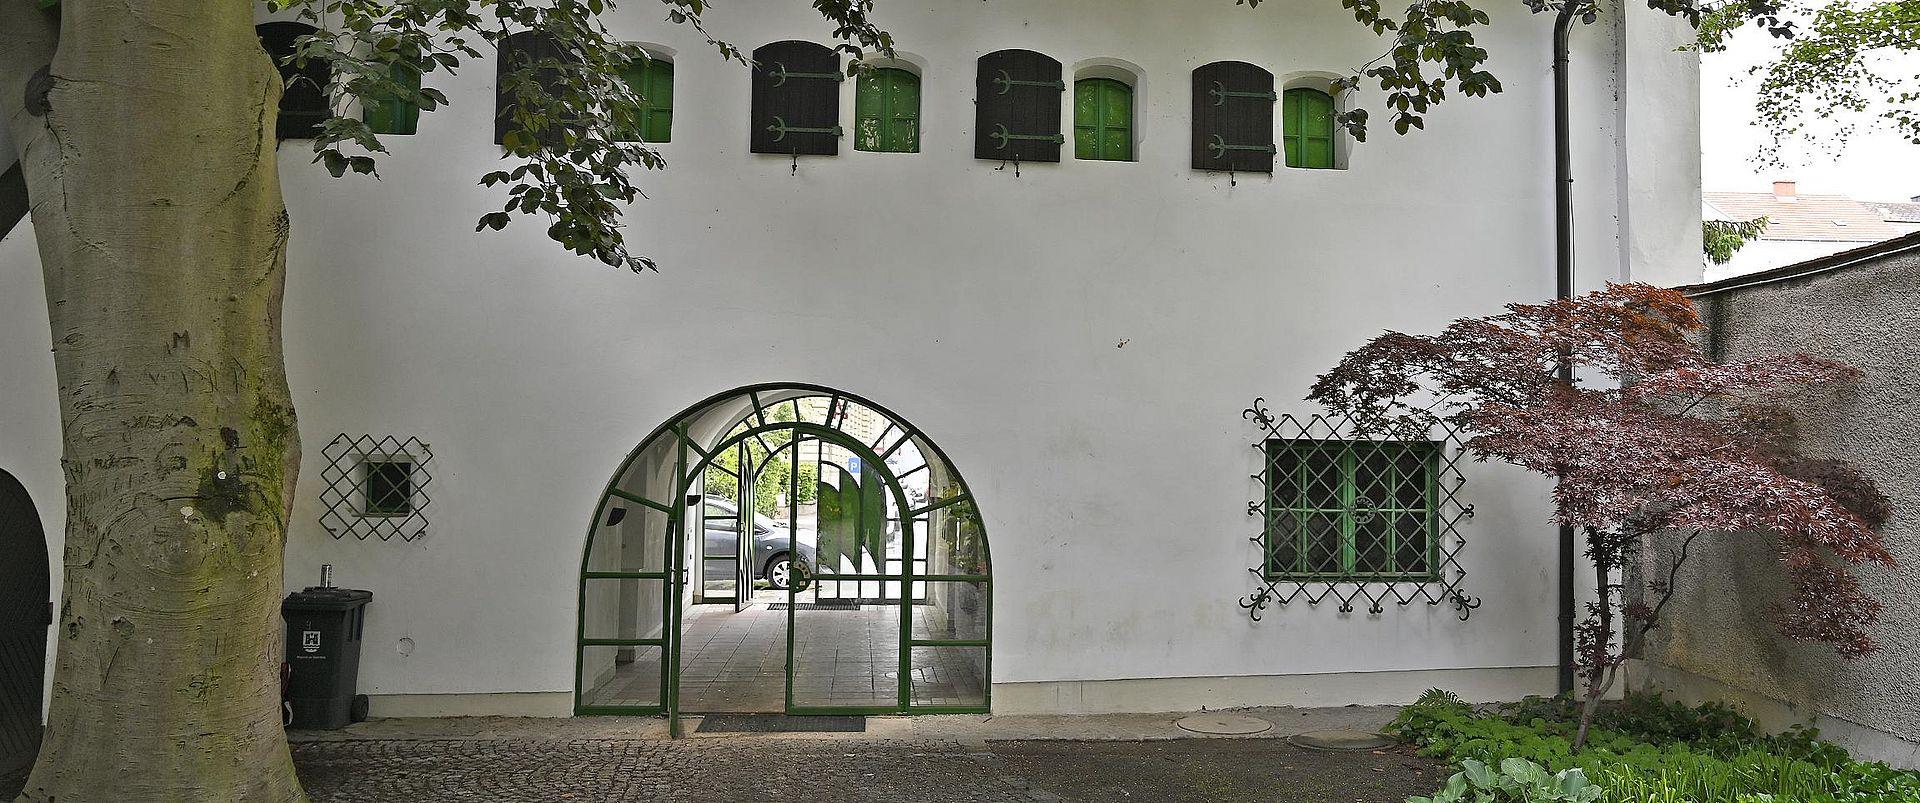 Kornspeicher Garten